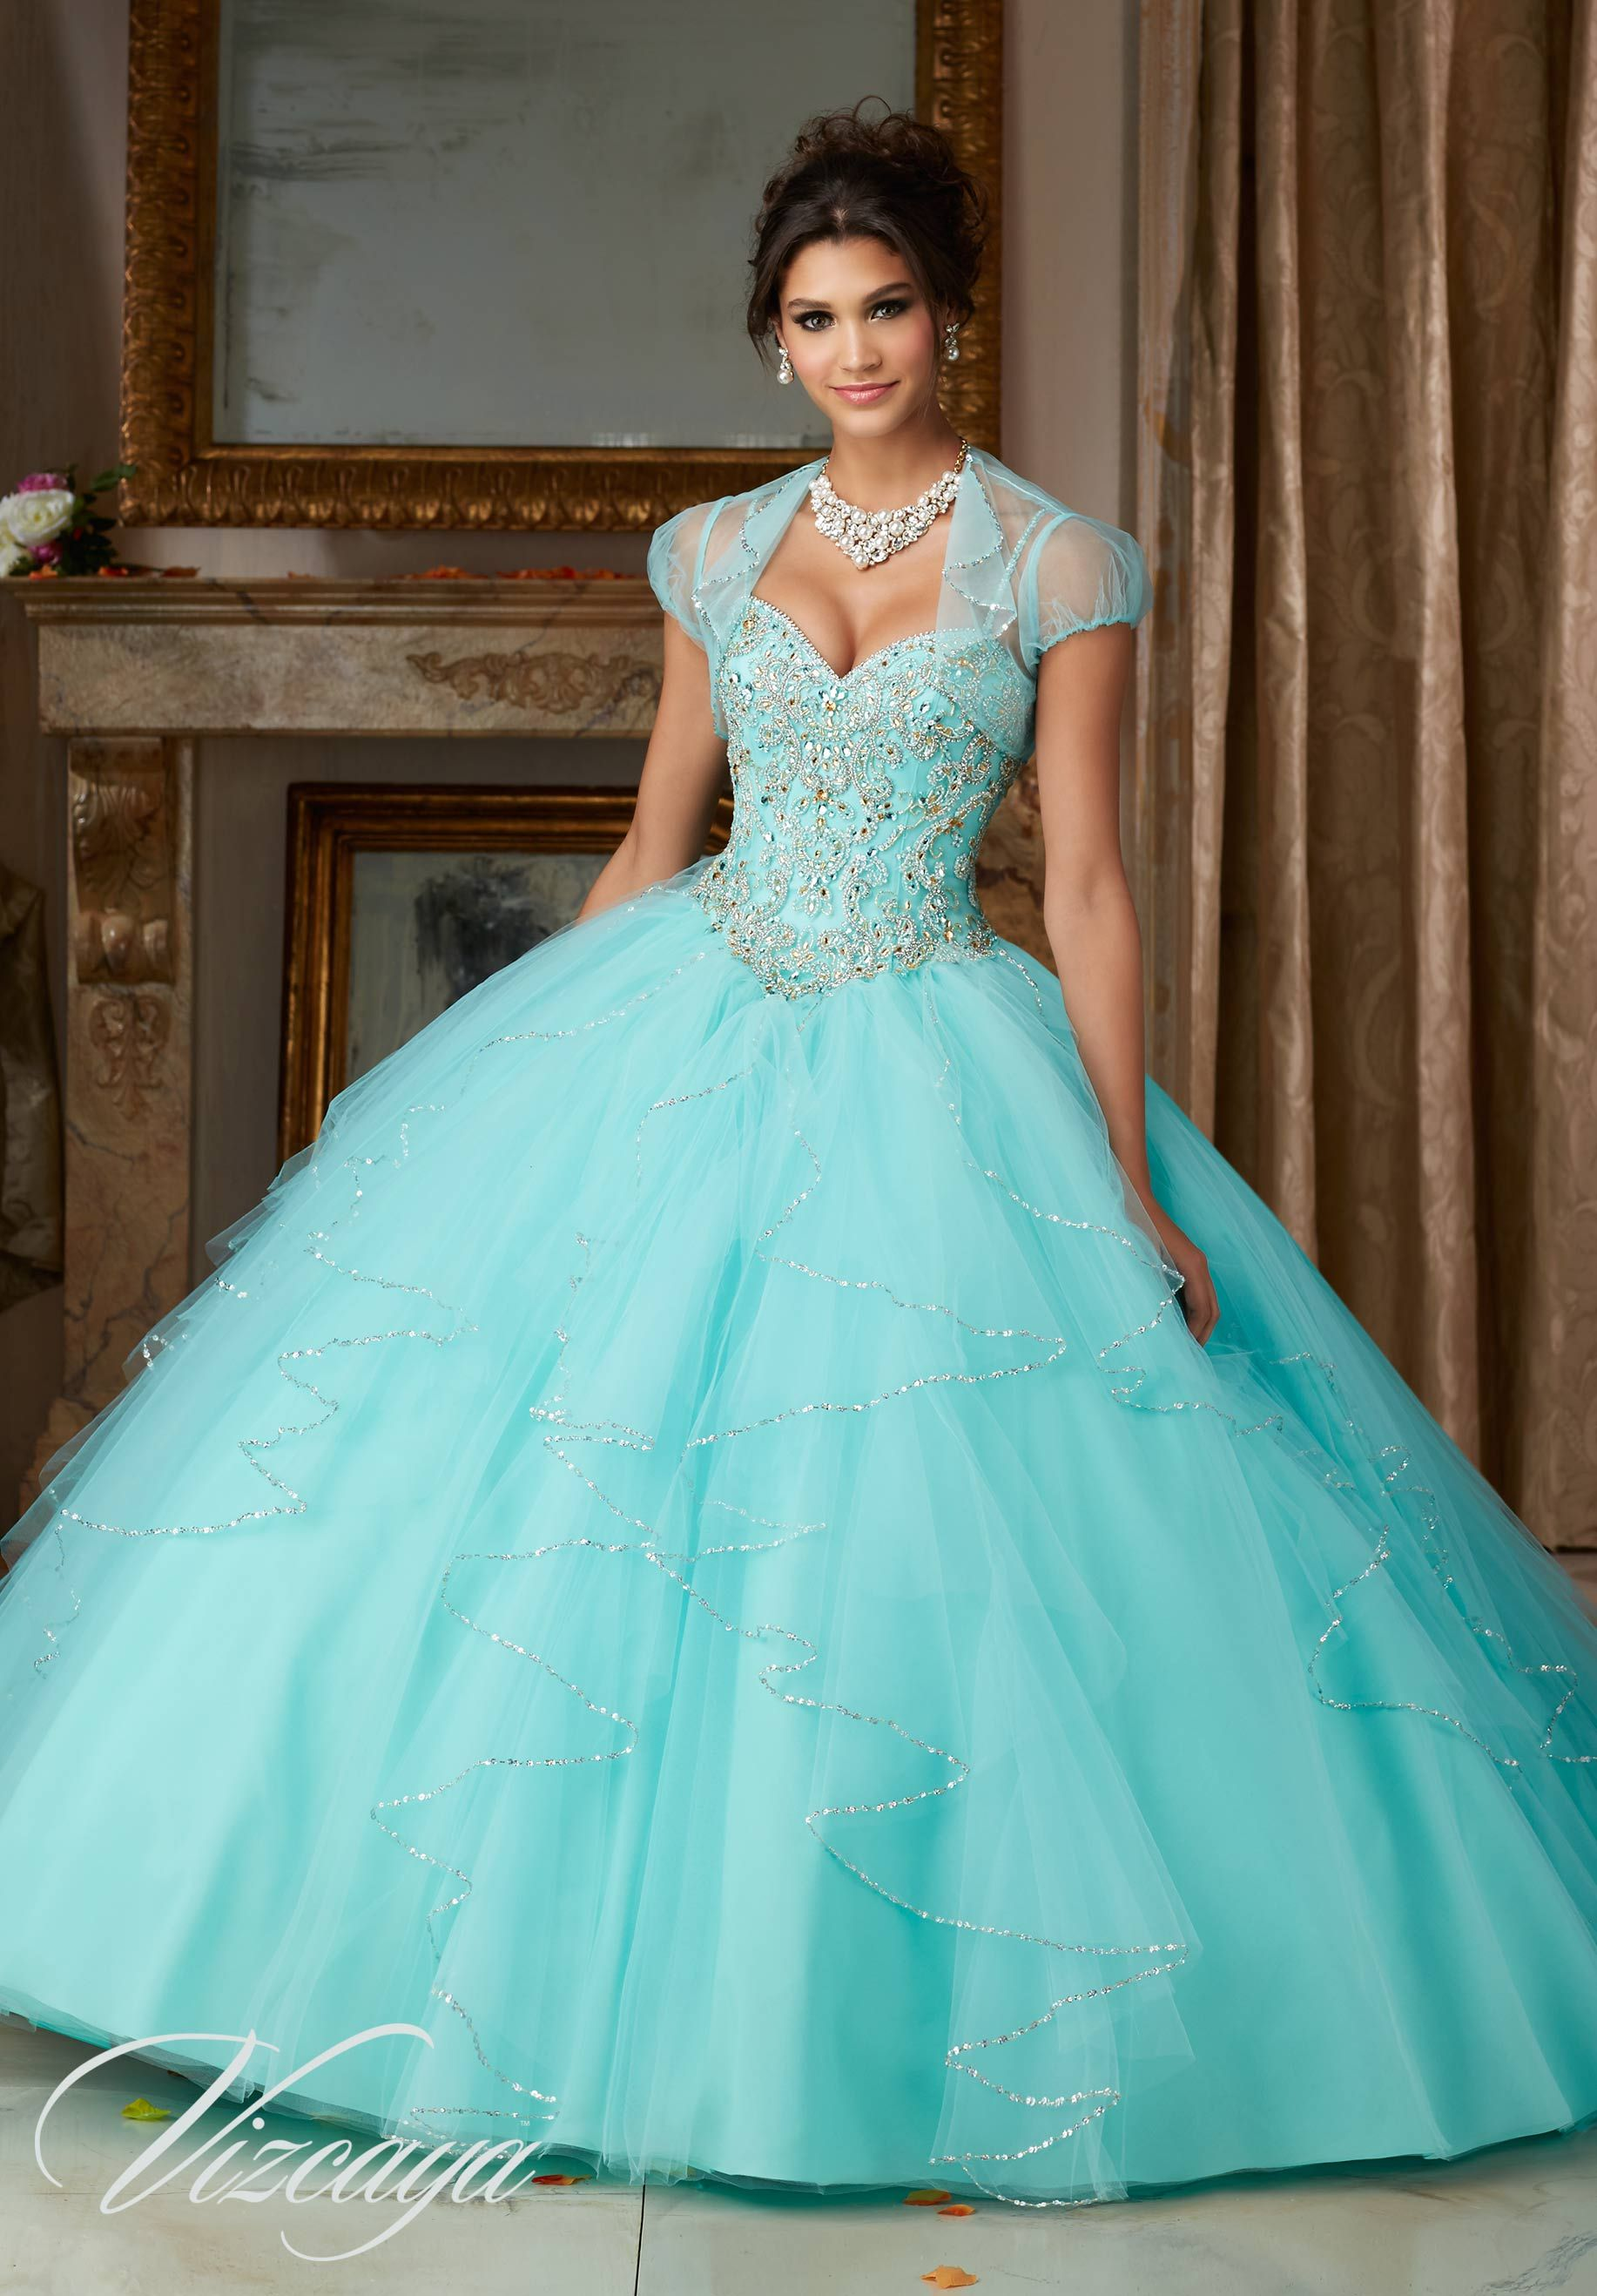 Jeweled Beading on a Flounced Tulle Quinceañera Dress | Blue ...